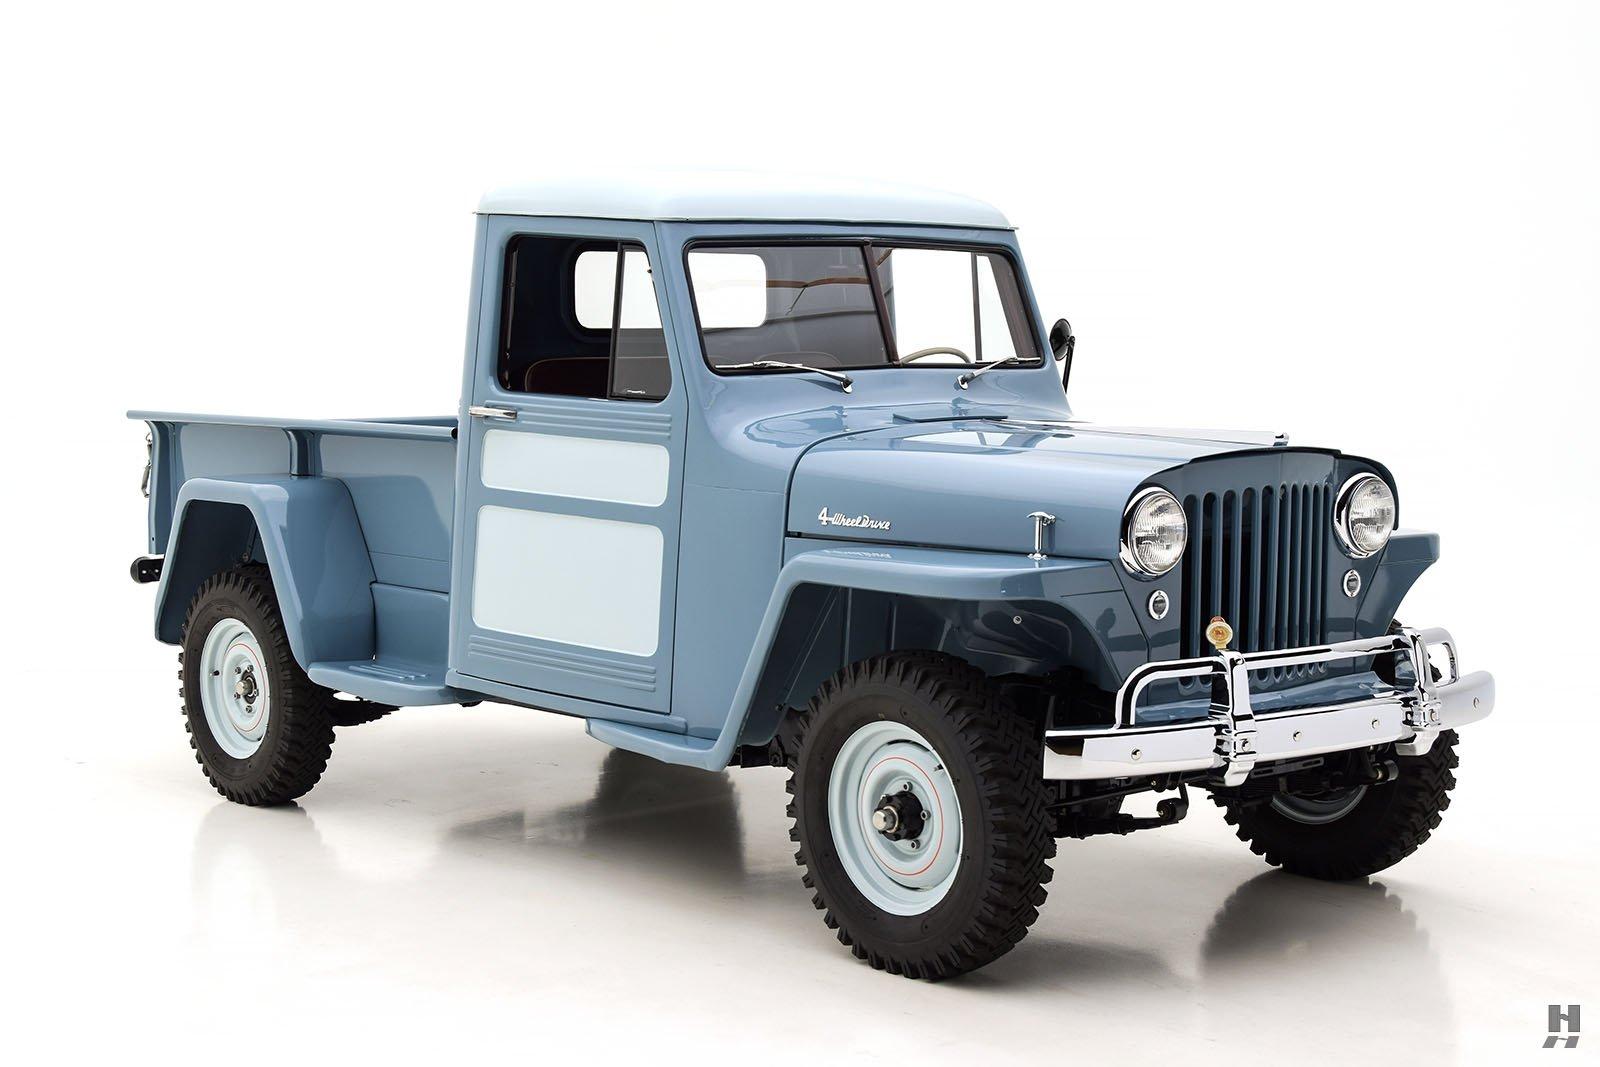 1948 Willys Overland Jeep Pickup Hyman Ltd Classic Cars